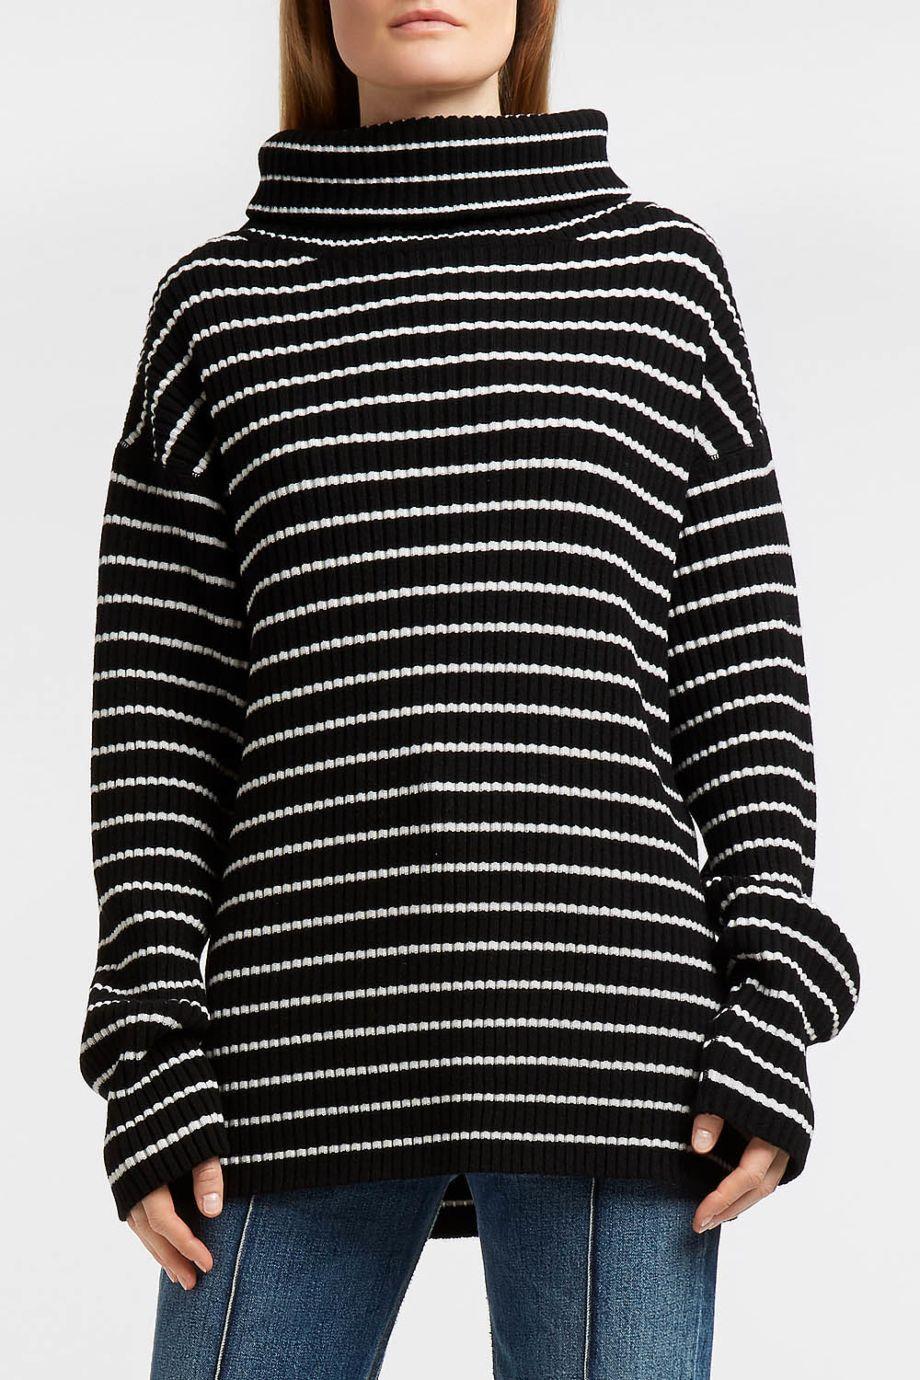 The Gigi Striped Merino Wool Polo Neck Jumper